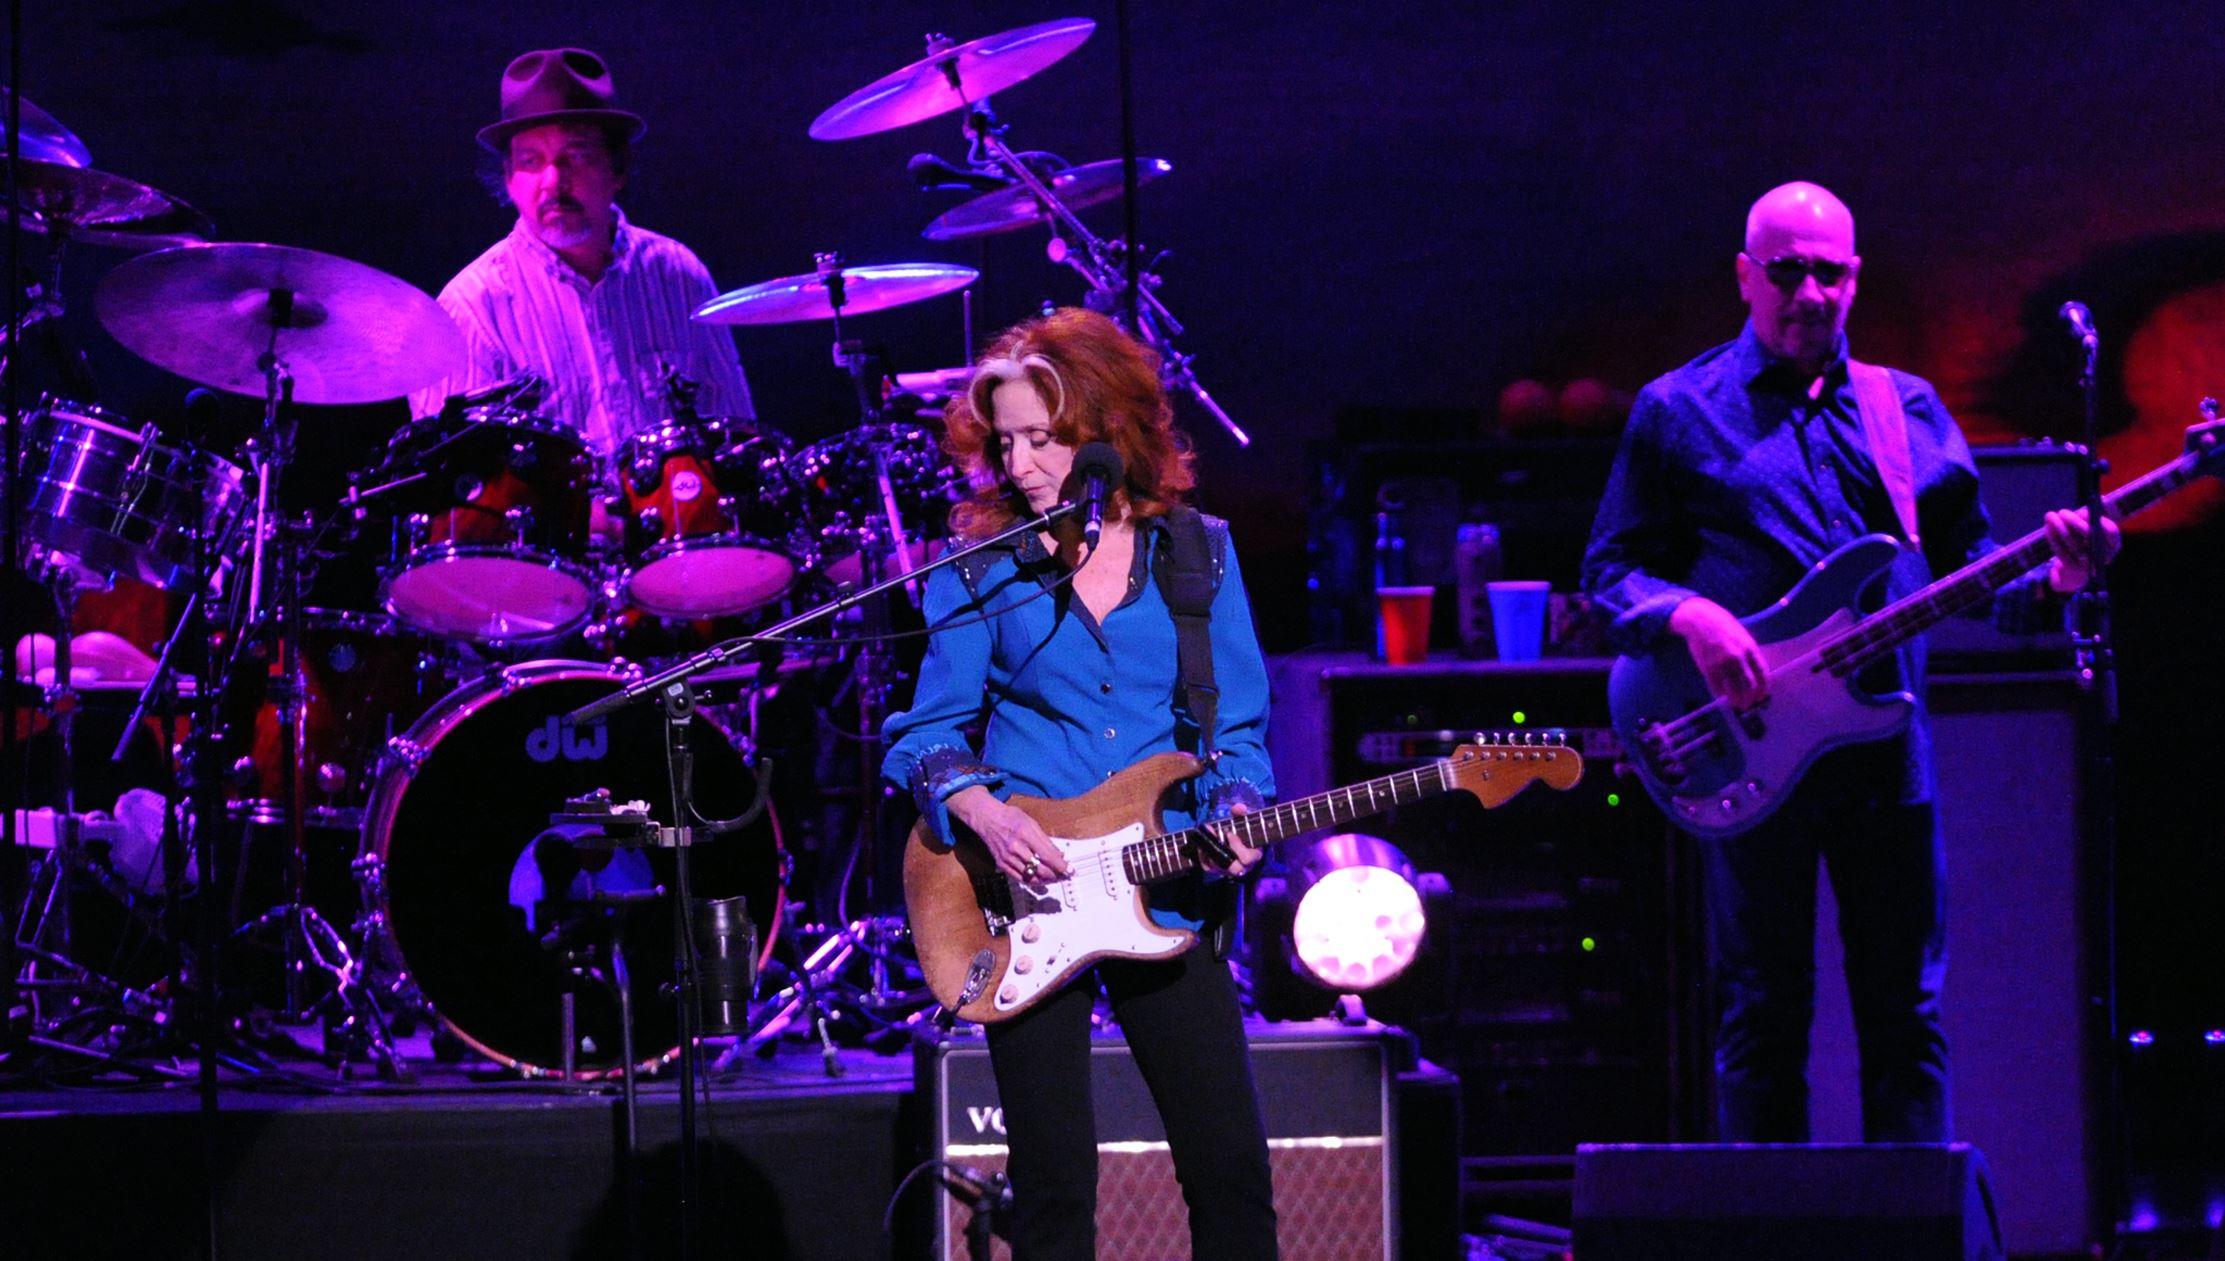 Bonnie Raitt at Heinz Hall with bassist Hutch Hutchinson and drummer Ricky Fataar. © John Heller/Post-Gazette